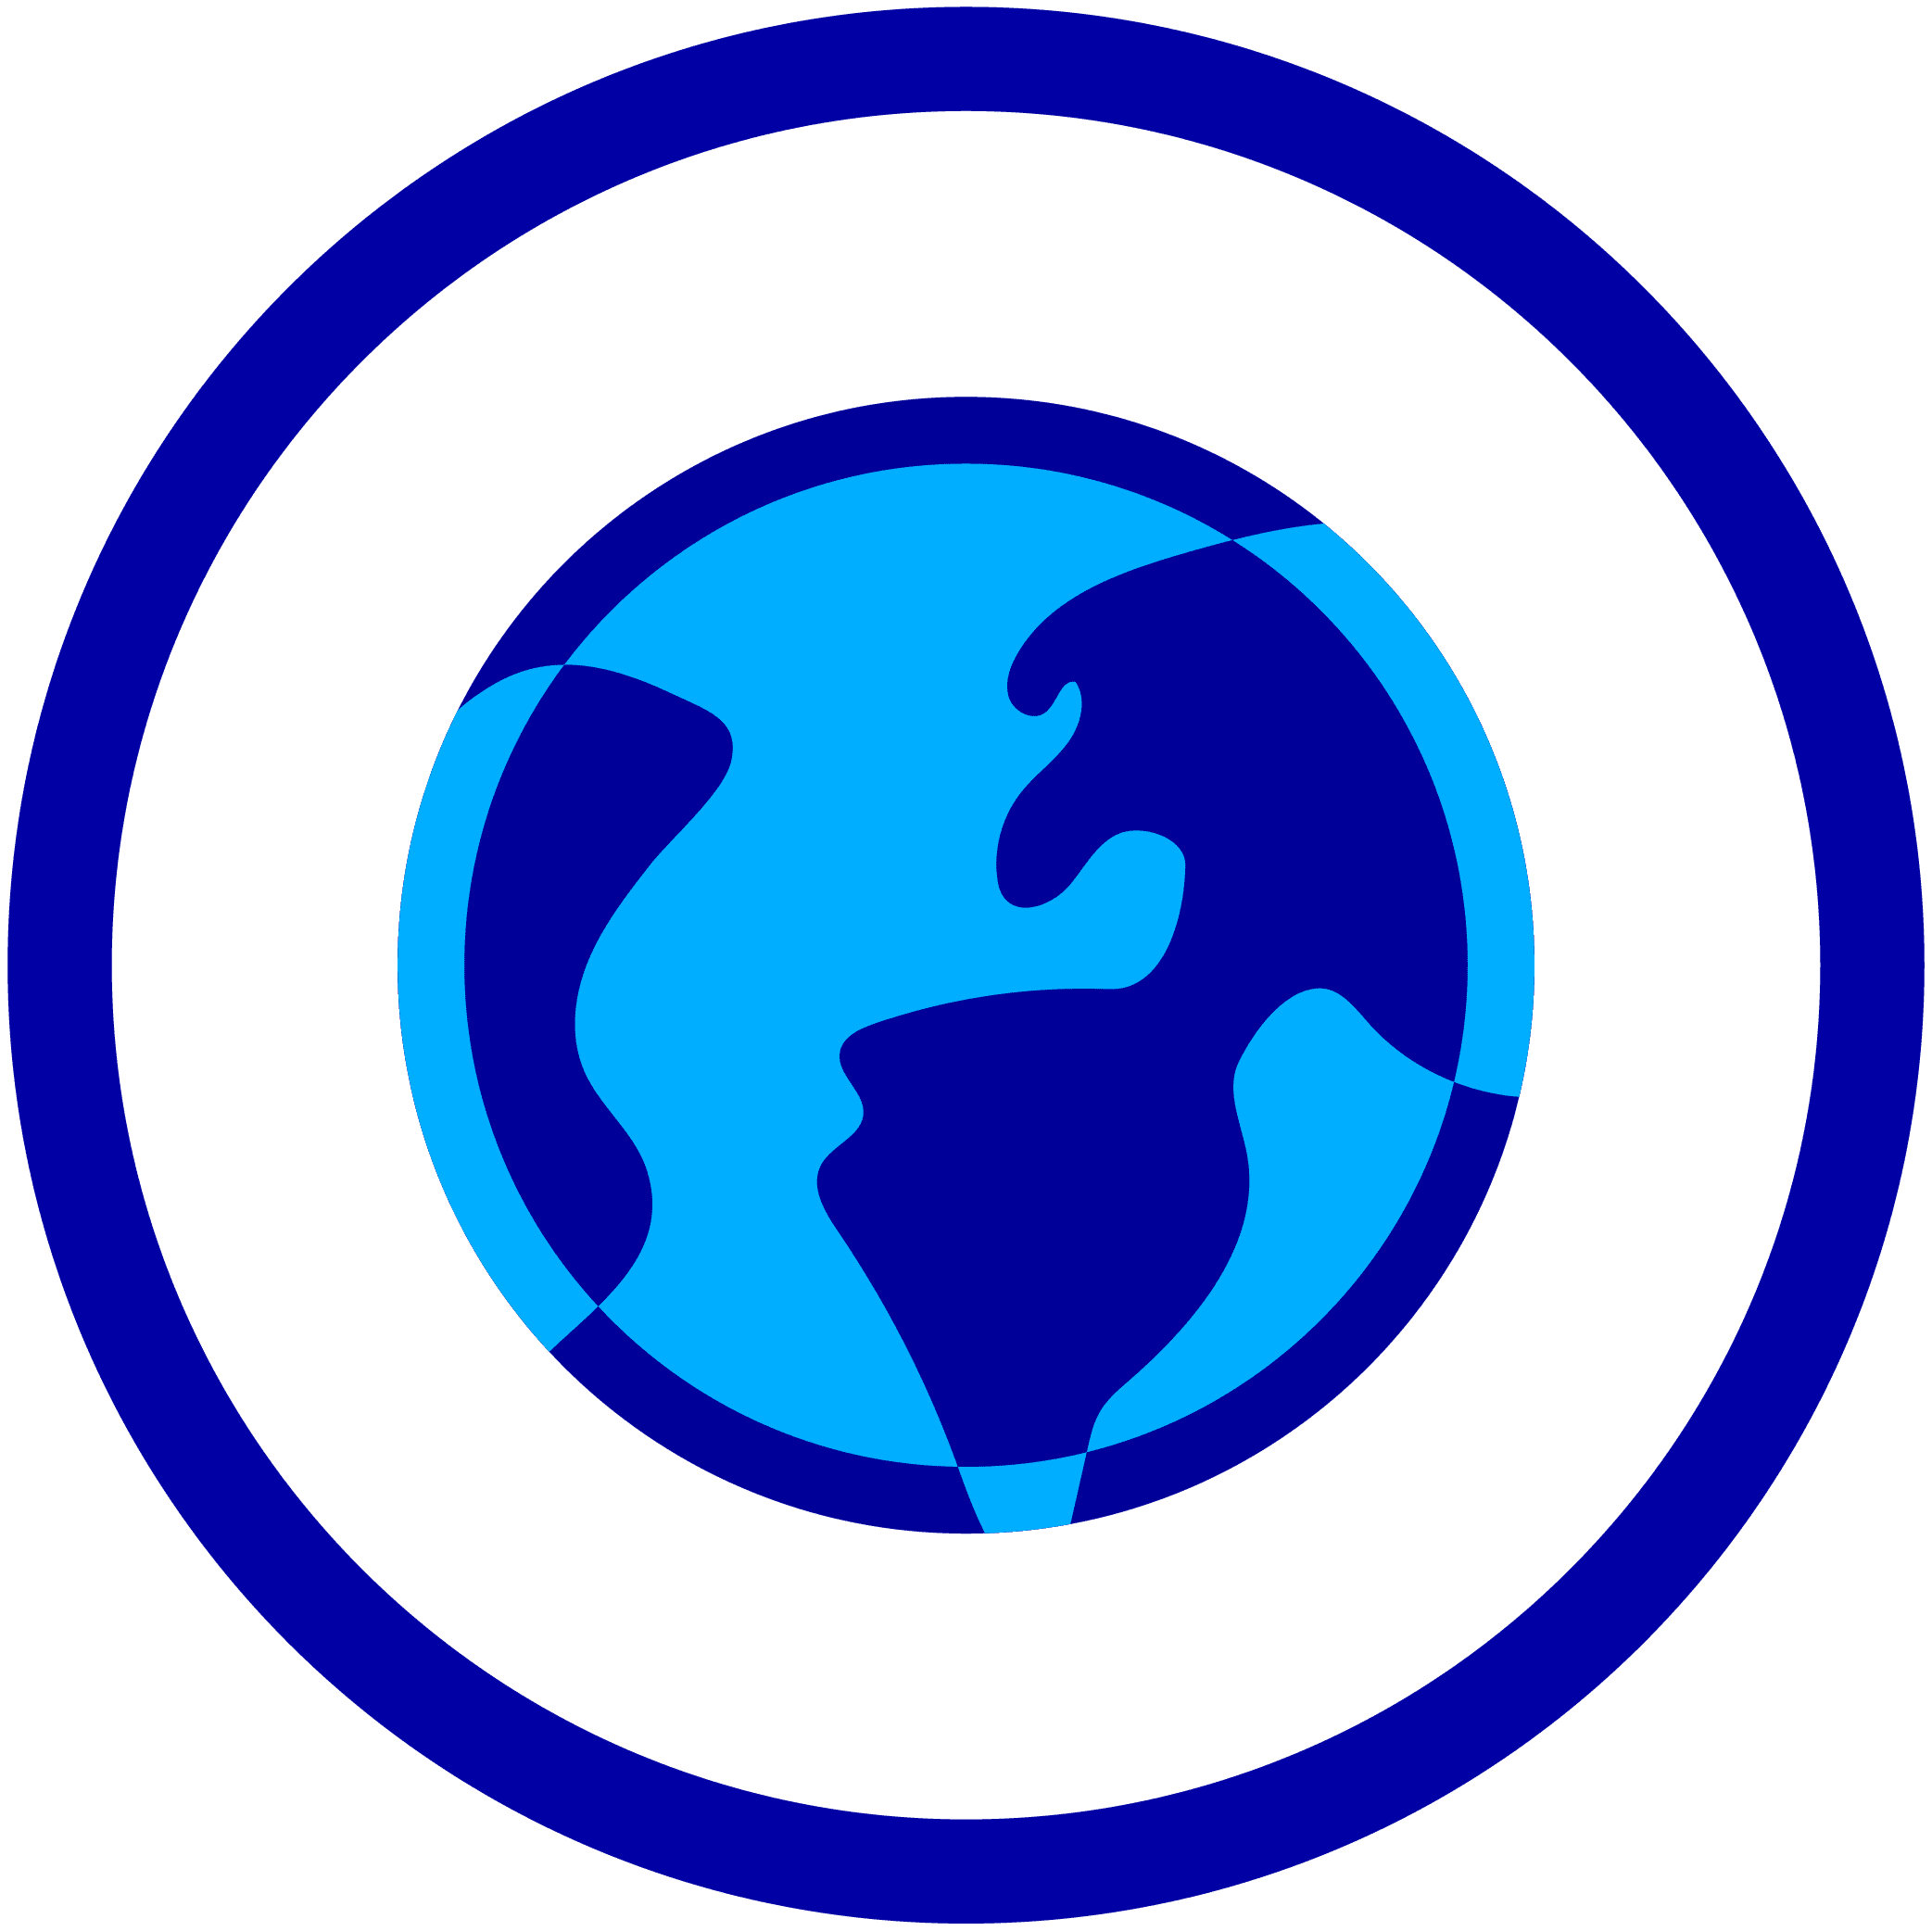 https://pt.fi-group.com/wp-content/uploads/sites/6/2021/02/blue-icons-set_1-13.png